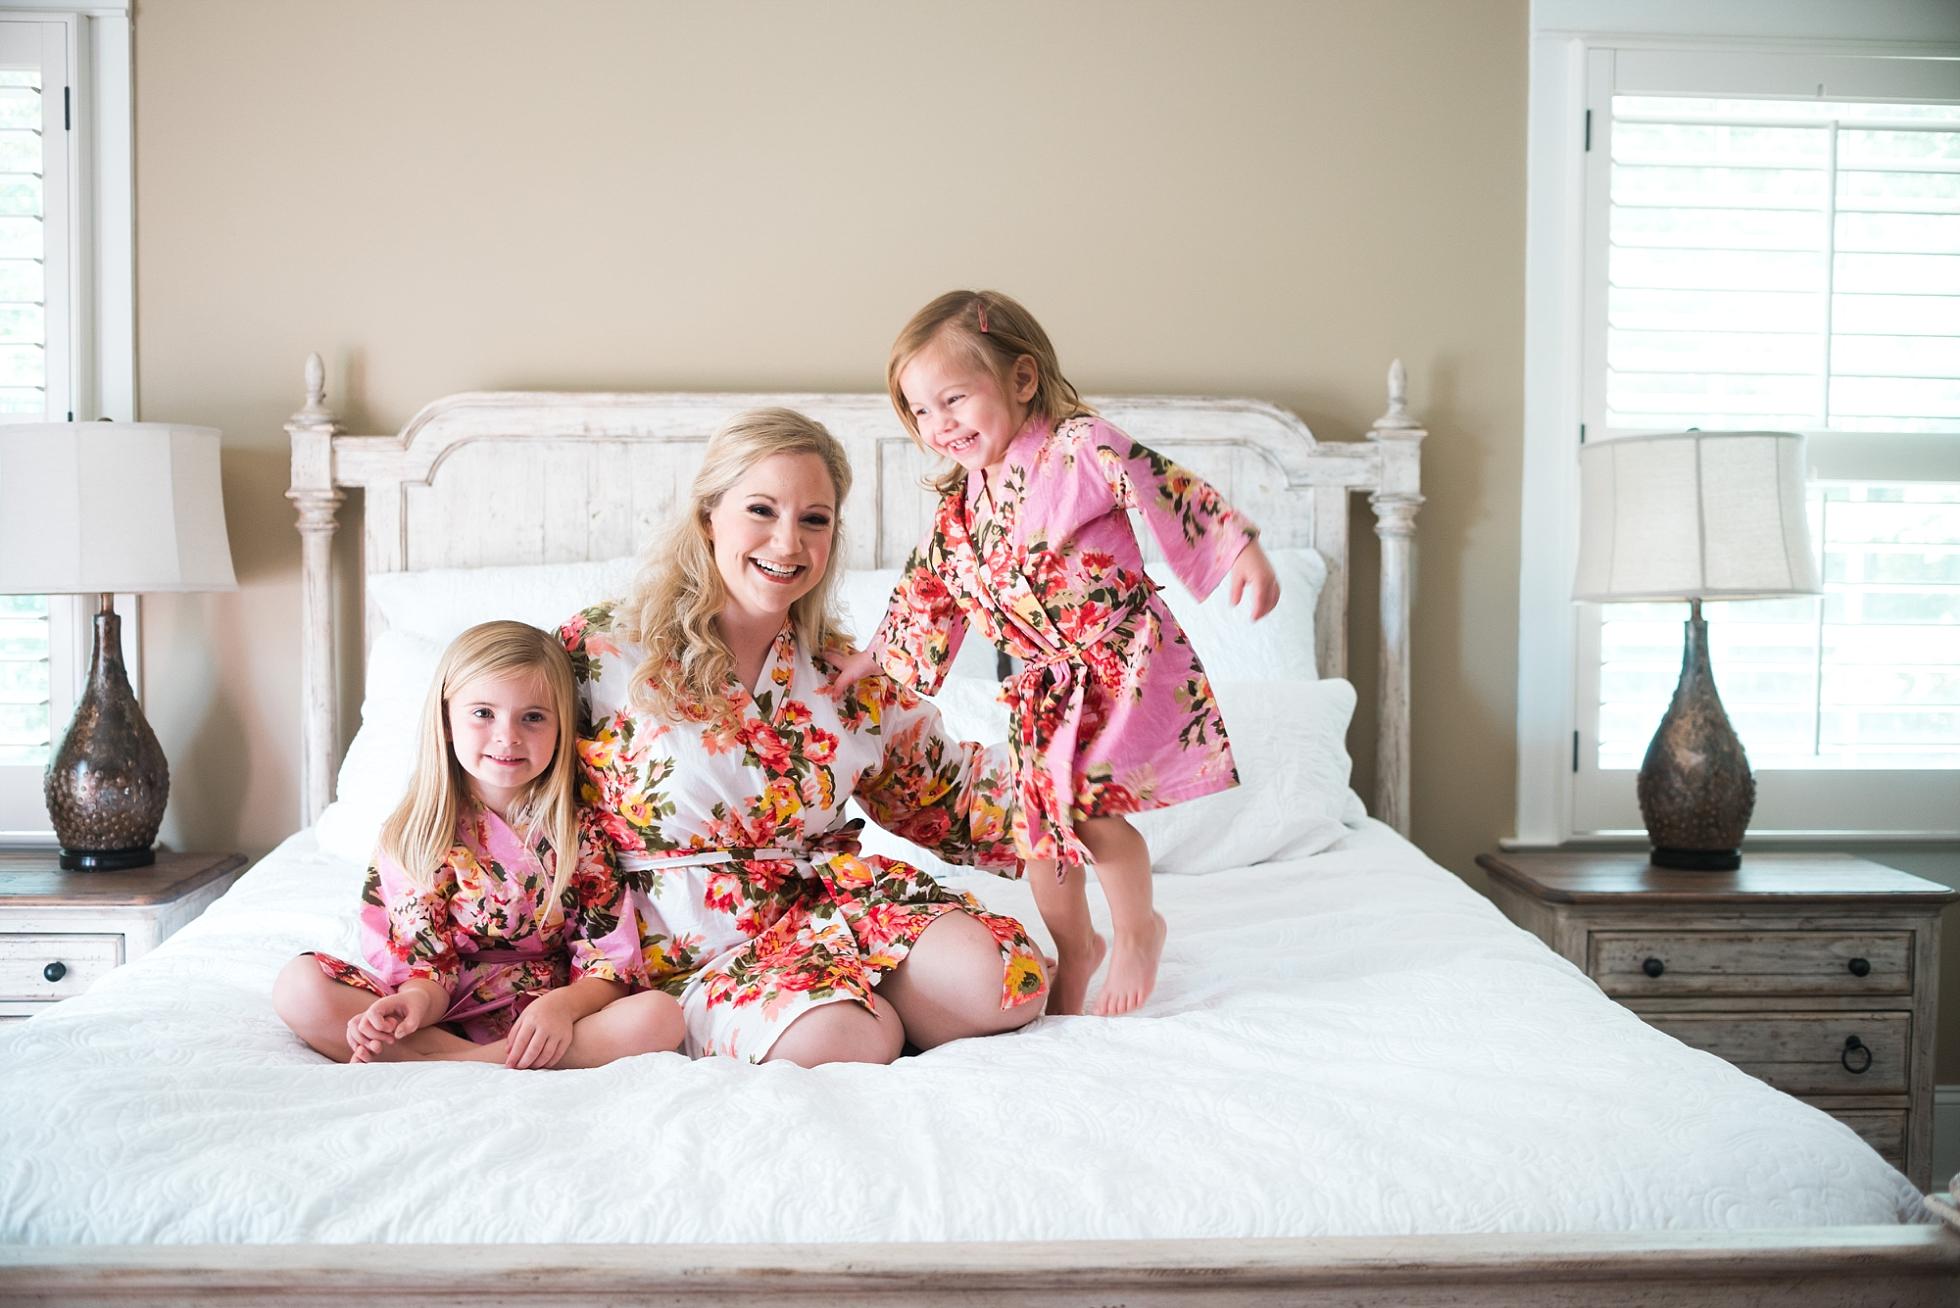 Bride with flower girls in Robes| Kyle & Erin | Scarbrough Wedding | Children's Harbor | Laura Wilkerson Photography